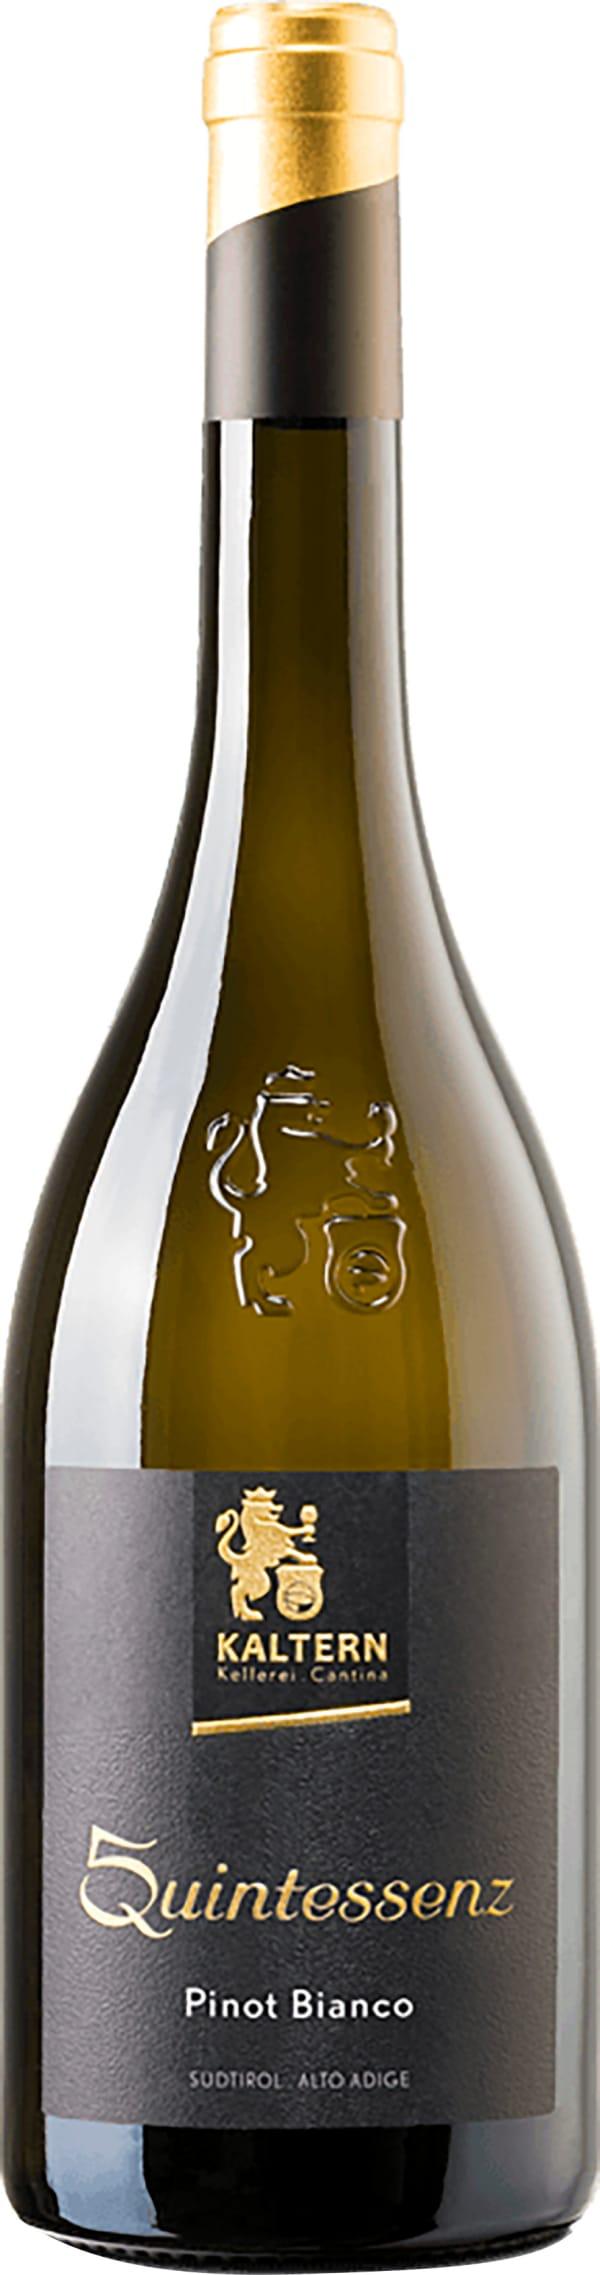 Kaltern Quintessenz Pinot Bianco 2017